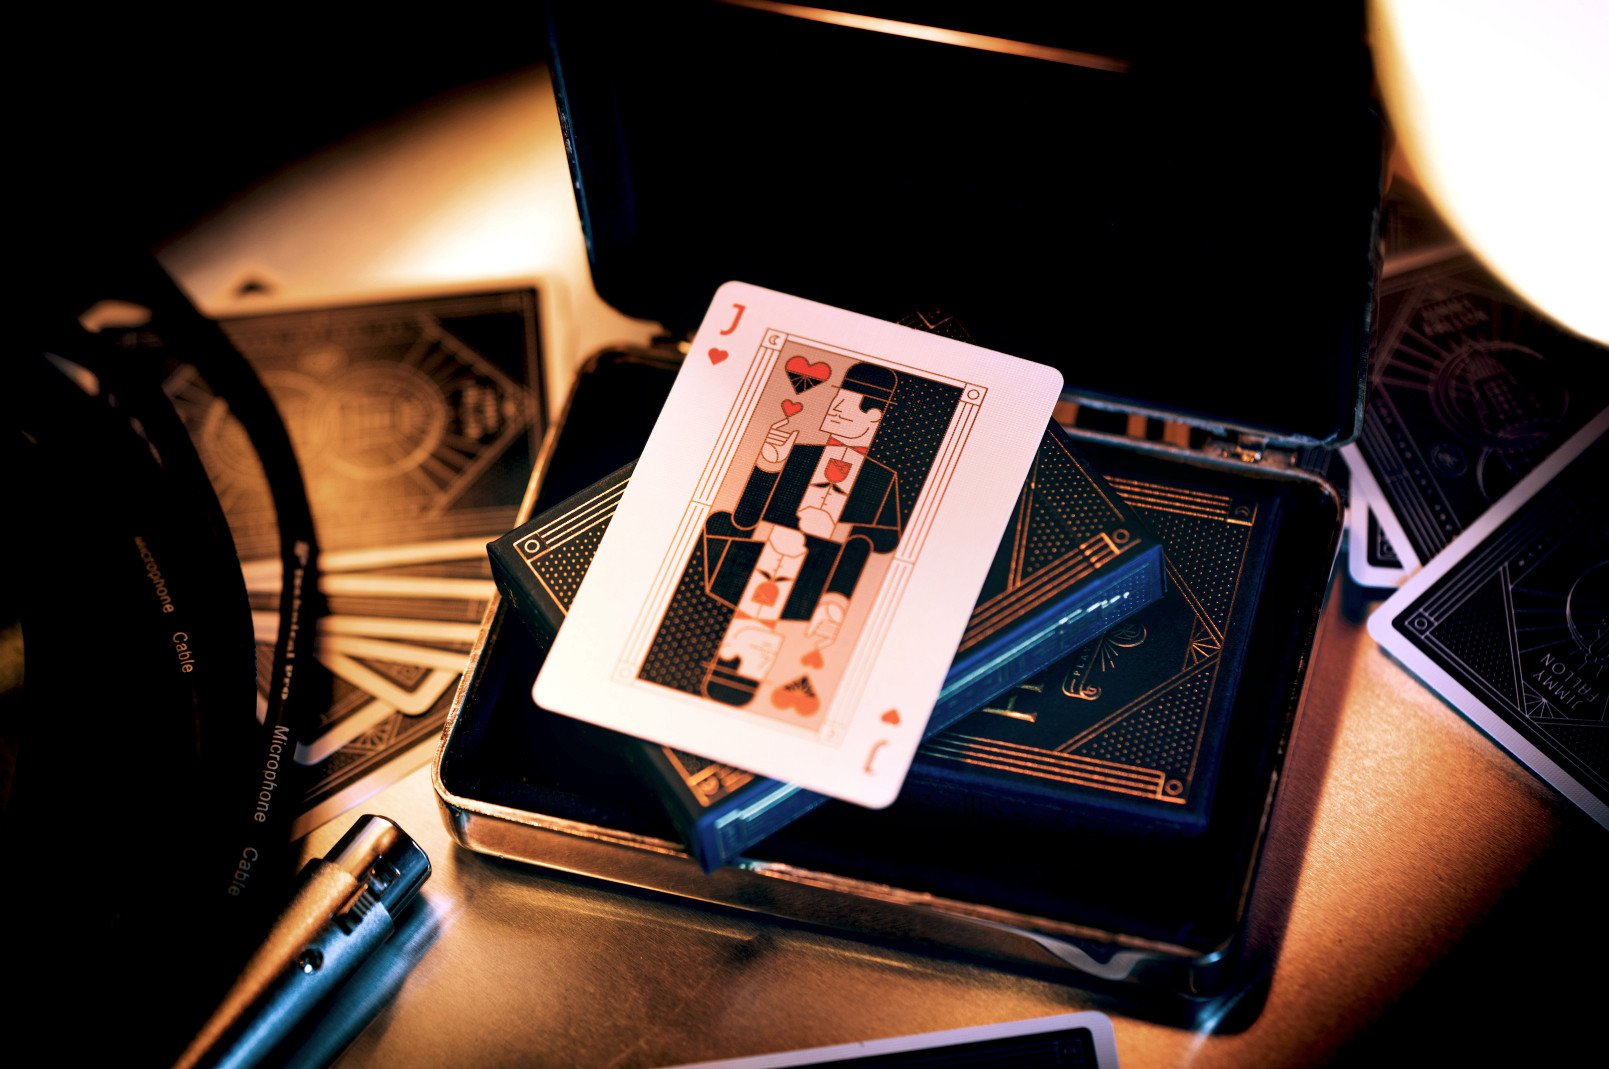 jimmy-fallon-playing-cards-05.jpg